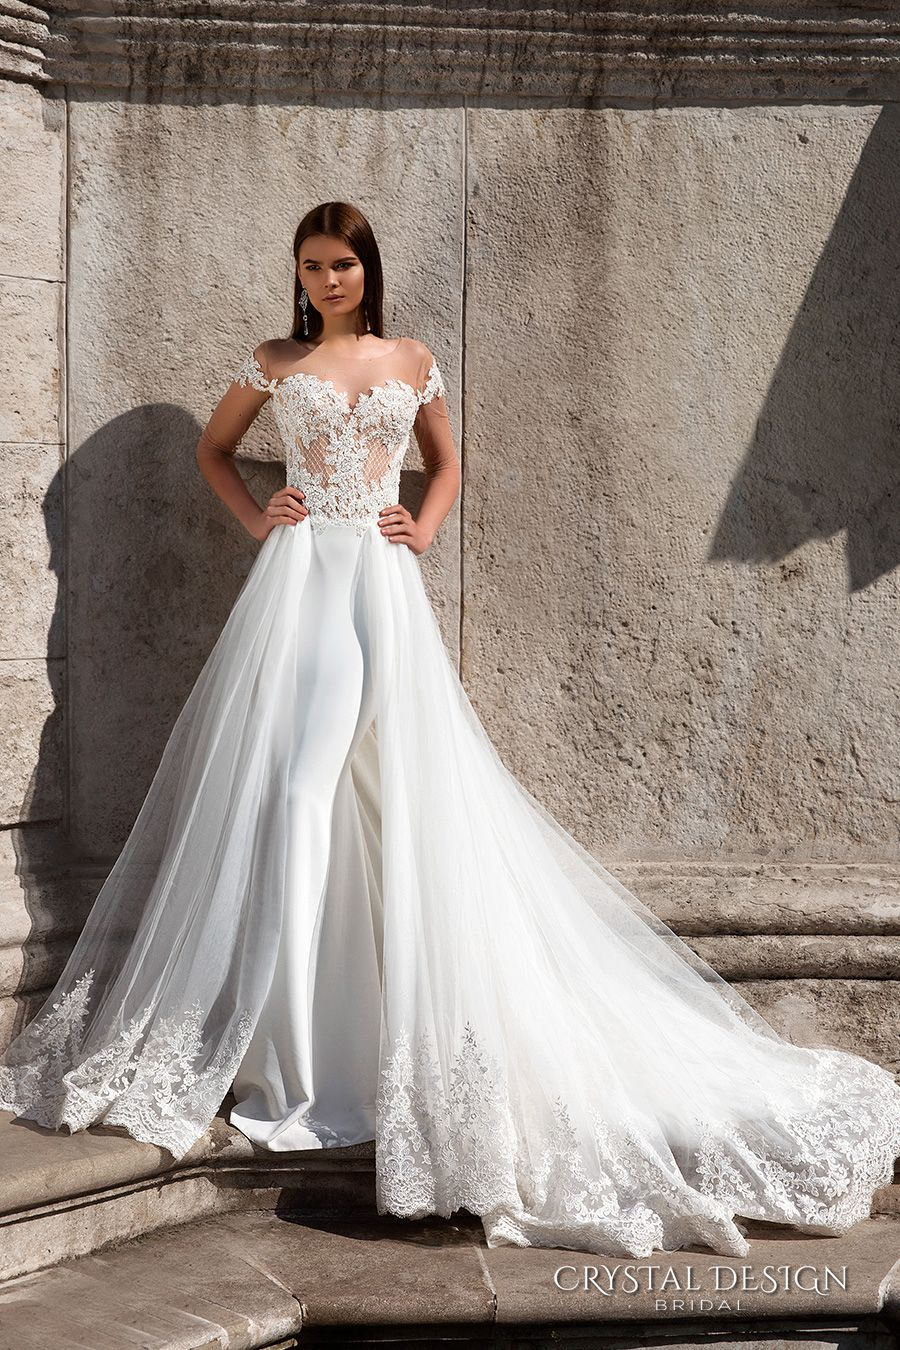 Wedding dress short in front with long train  Crystal Design  Wedding Dresses  Wedding Inspirasi  Pinterest